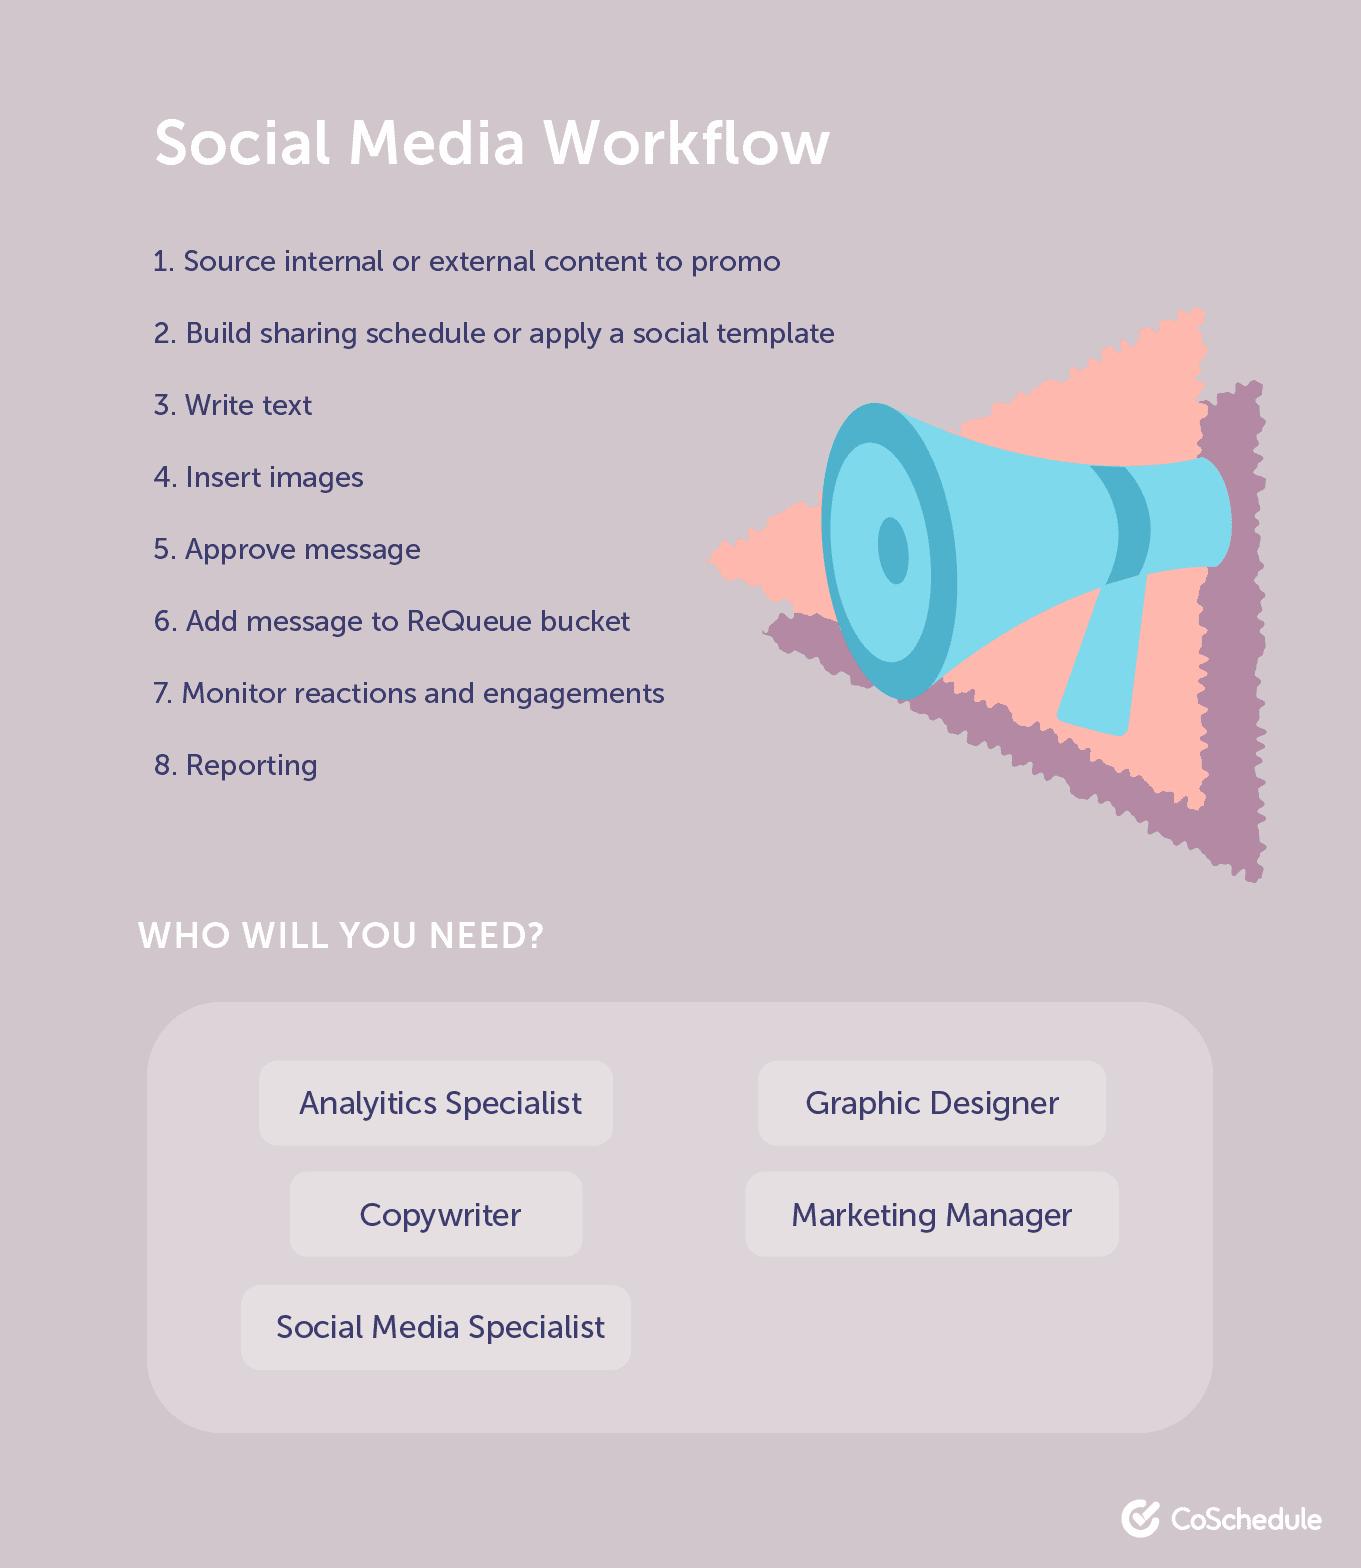 Social media workflow example